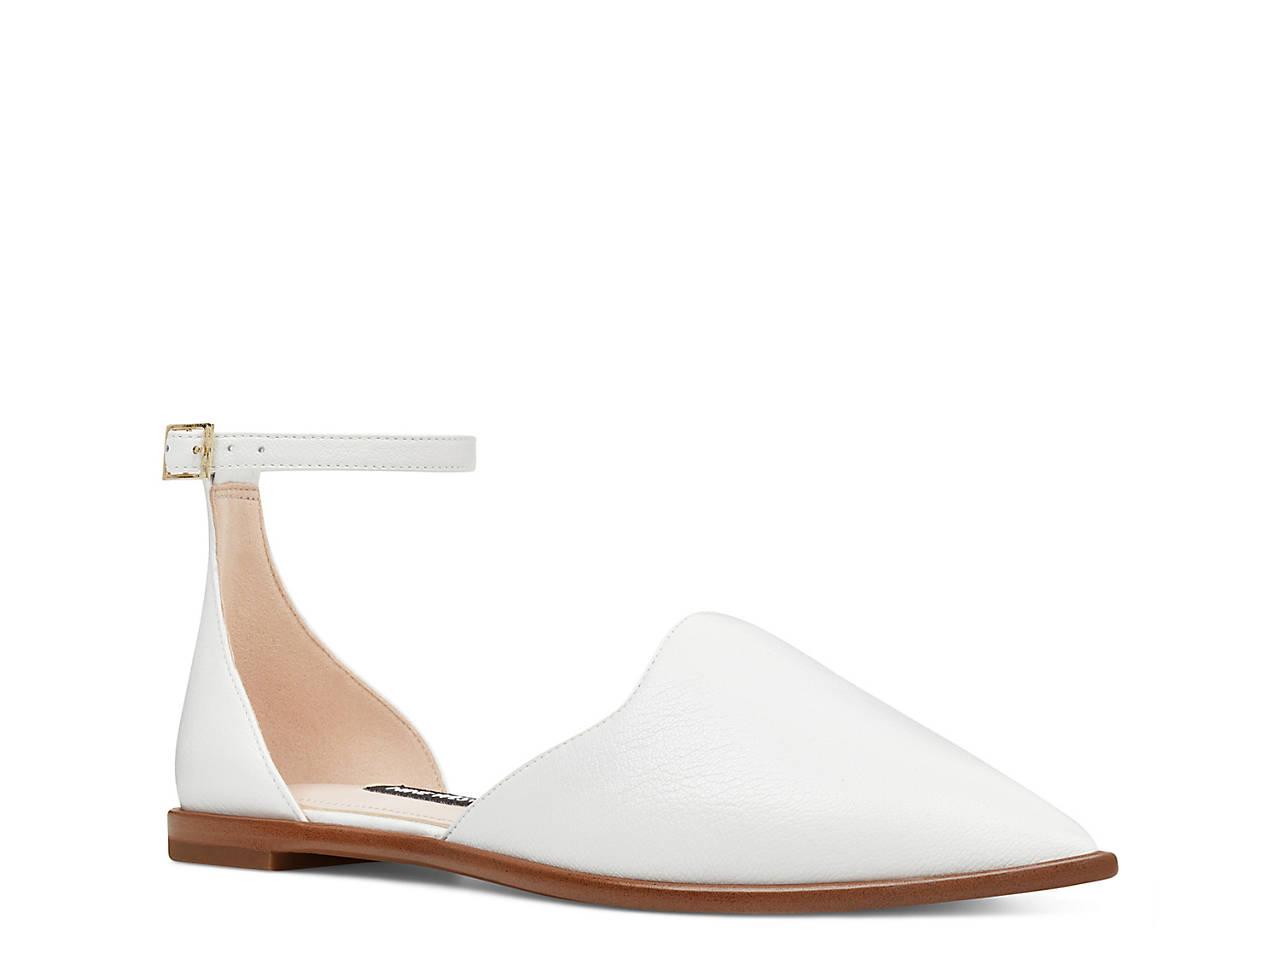 Nine West Women's Oriona Ankle Strap Flat nSUiE